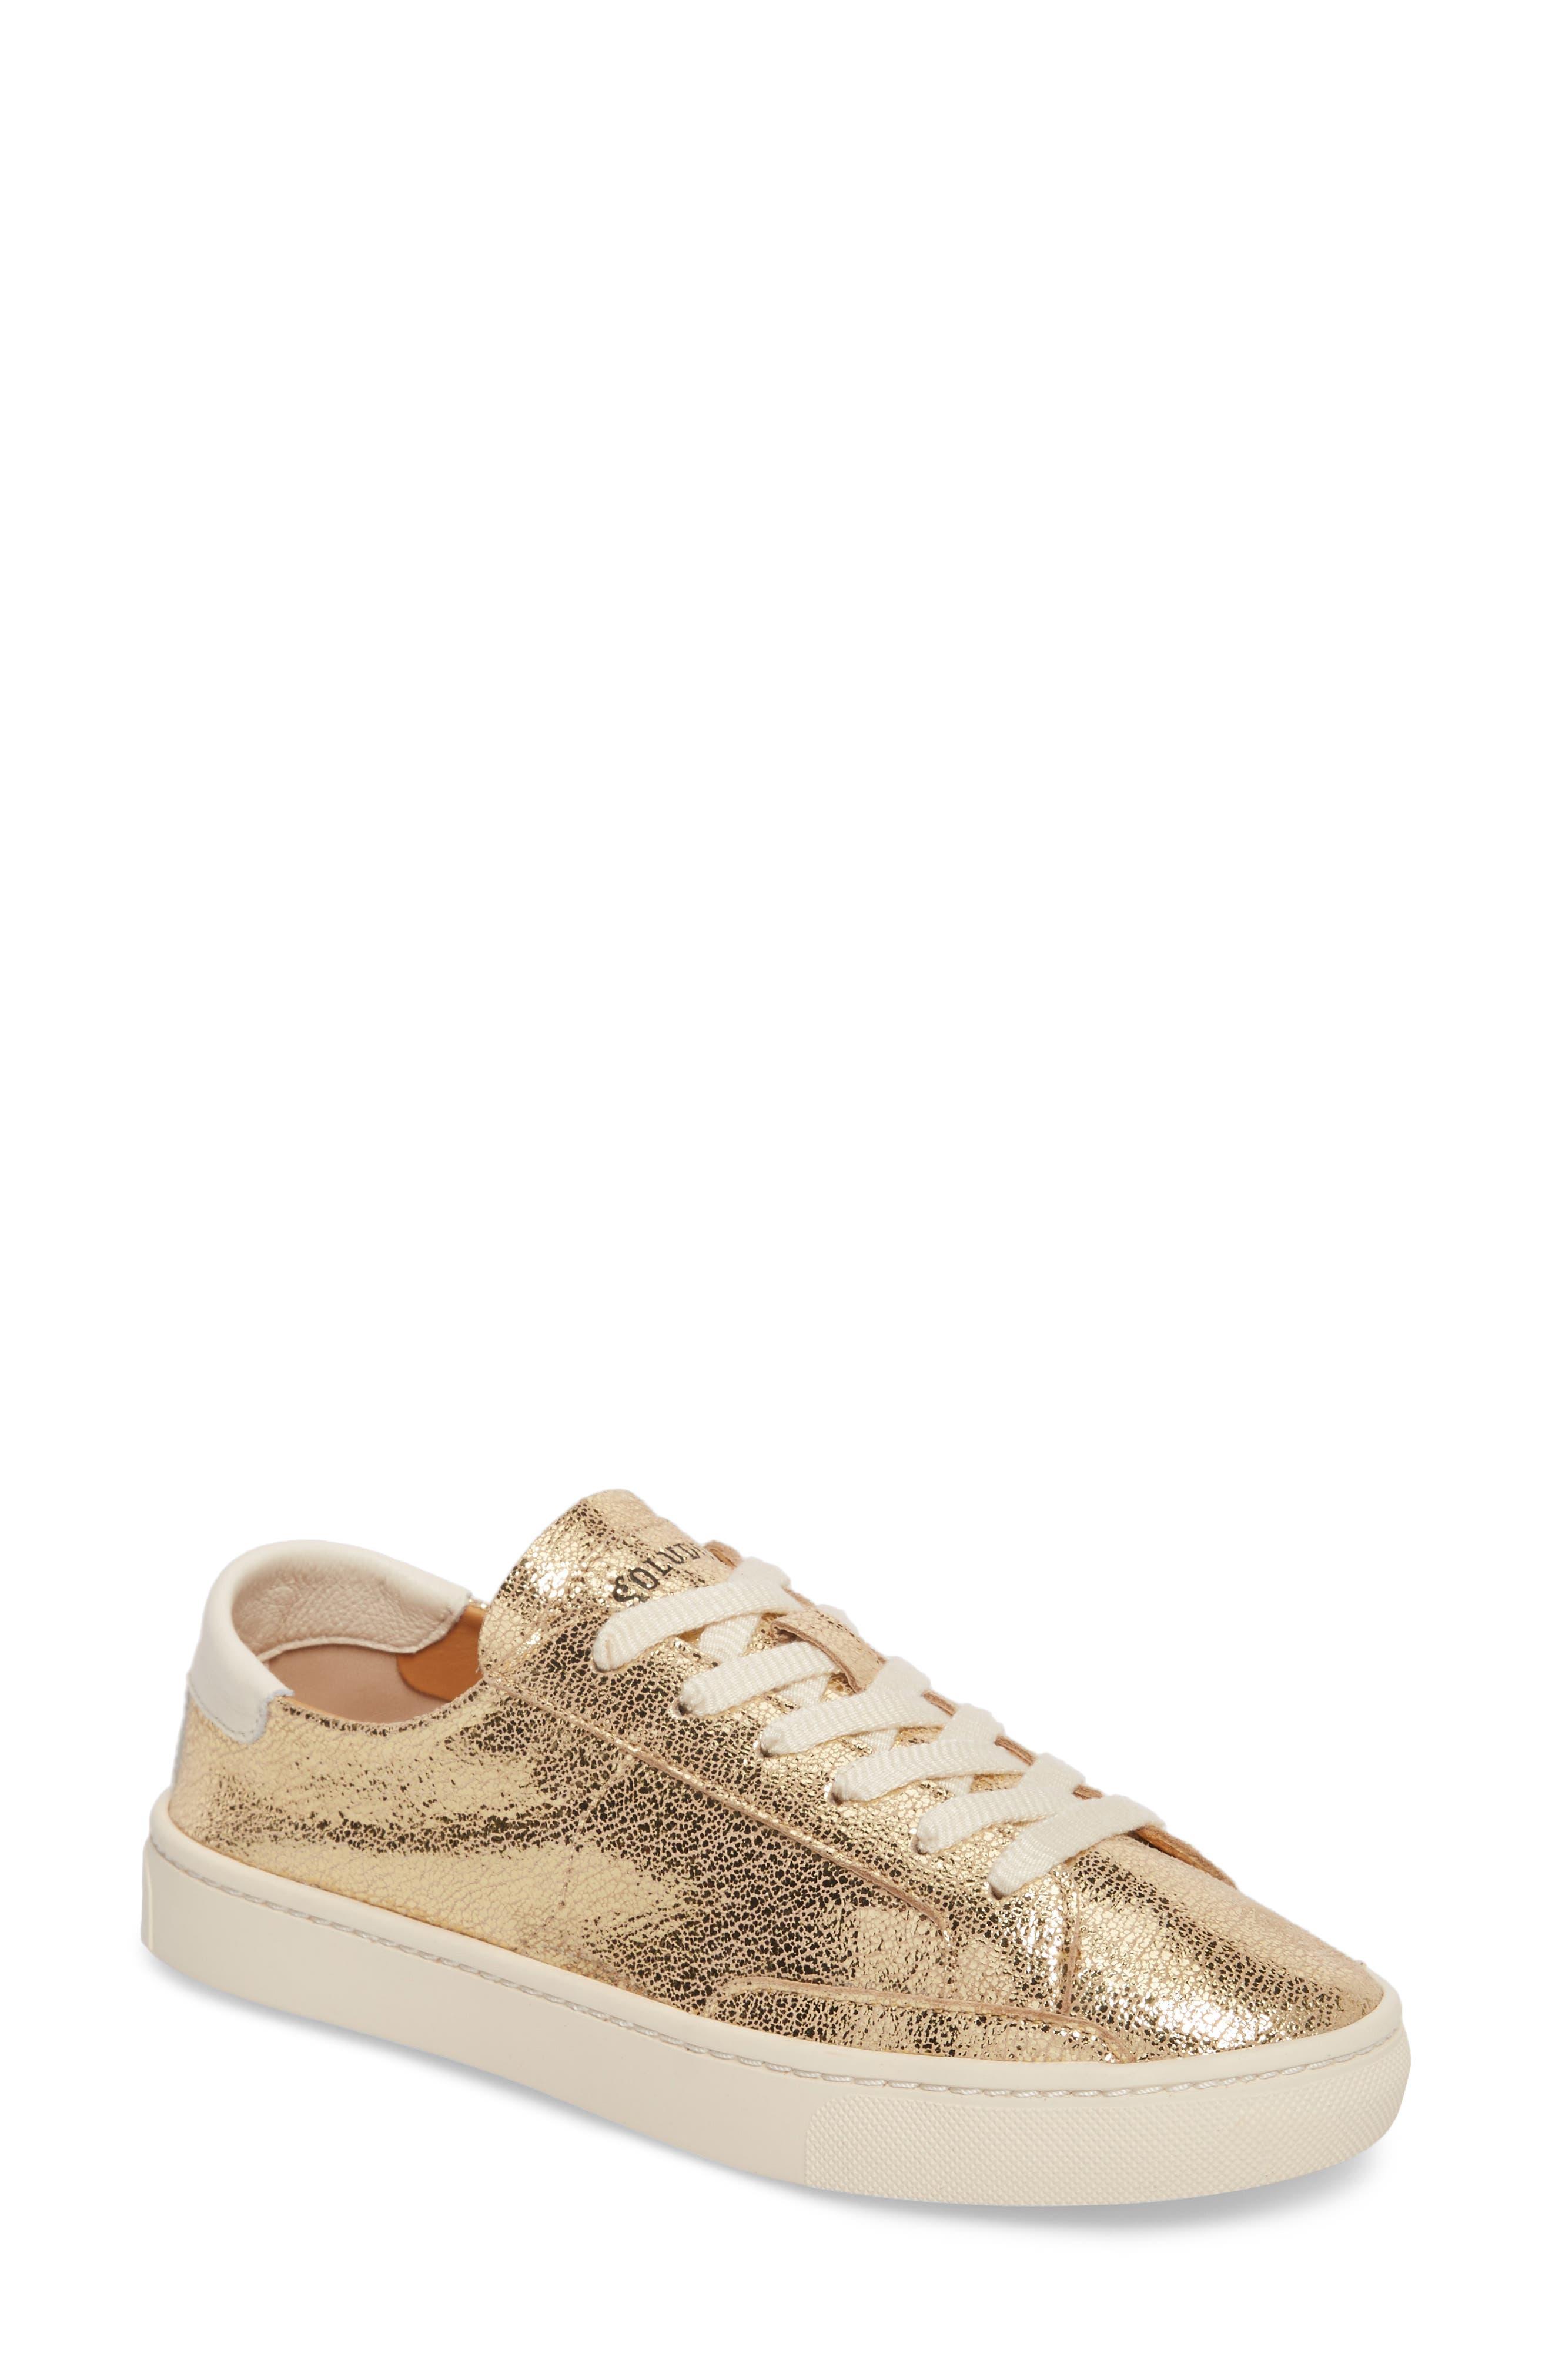 Ibiza Metallic Lace-Up Sneaker,                             Main thumbnail 1, color,                             711